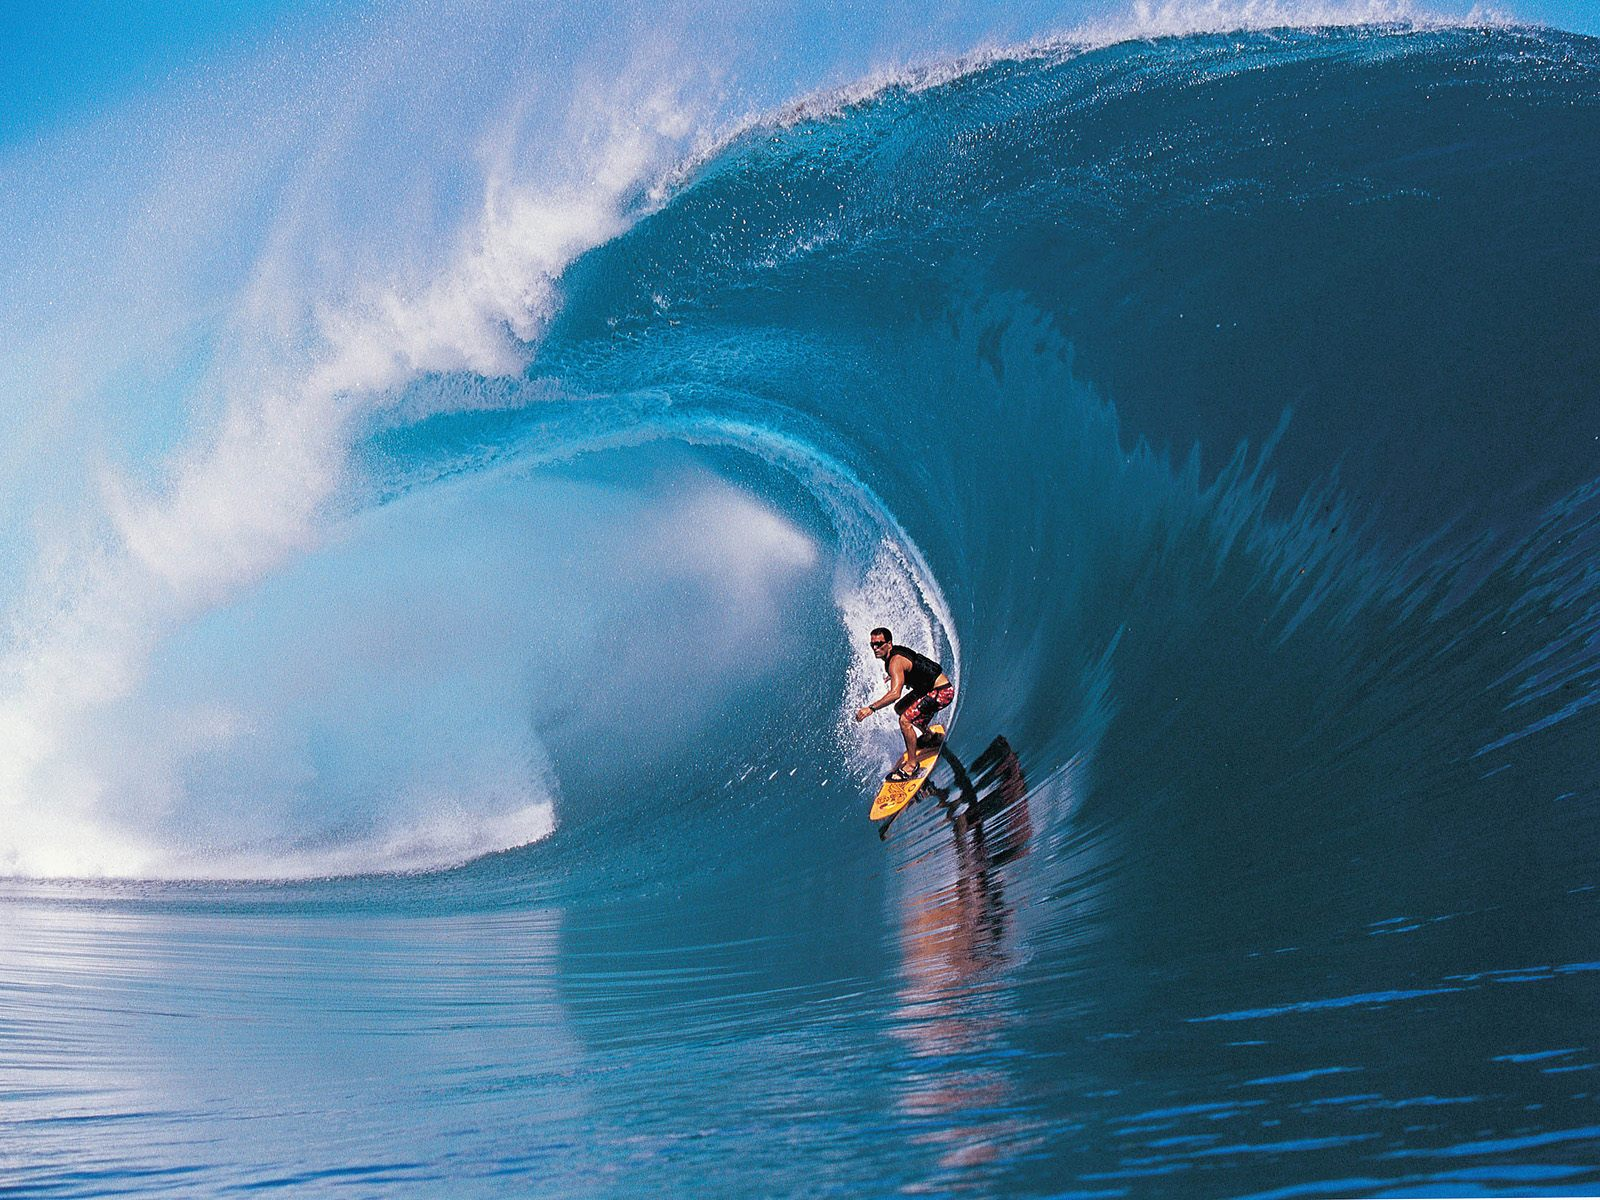 http://3.bp.blogspot.com/-JHikuS5BhEc/TZjqYZUKZSI/AAAAAAAAAZE/WLDcJxghCRE/s1600/Deportes-Surf1-387781.jpg